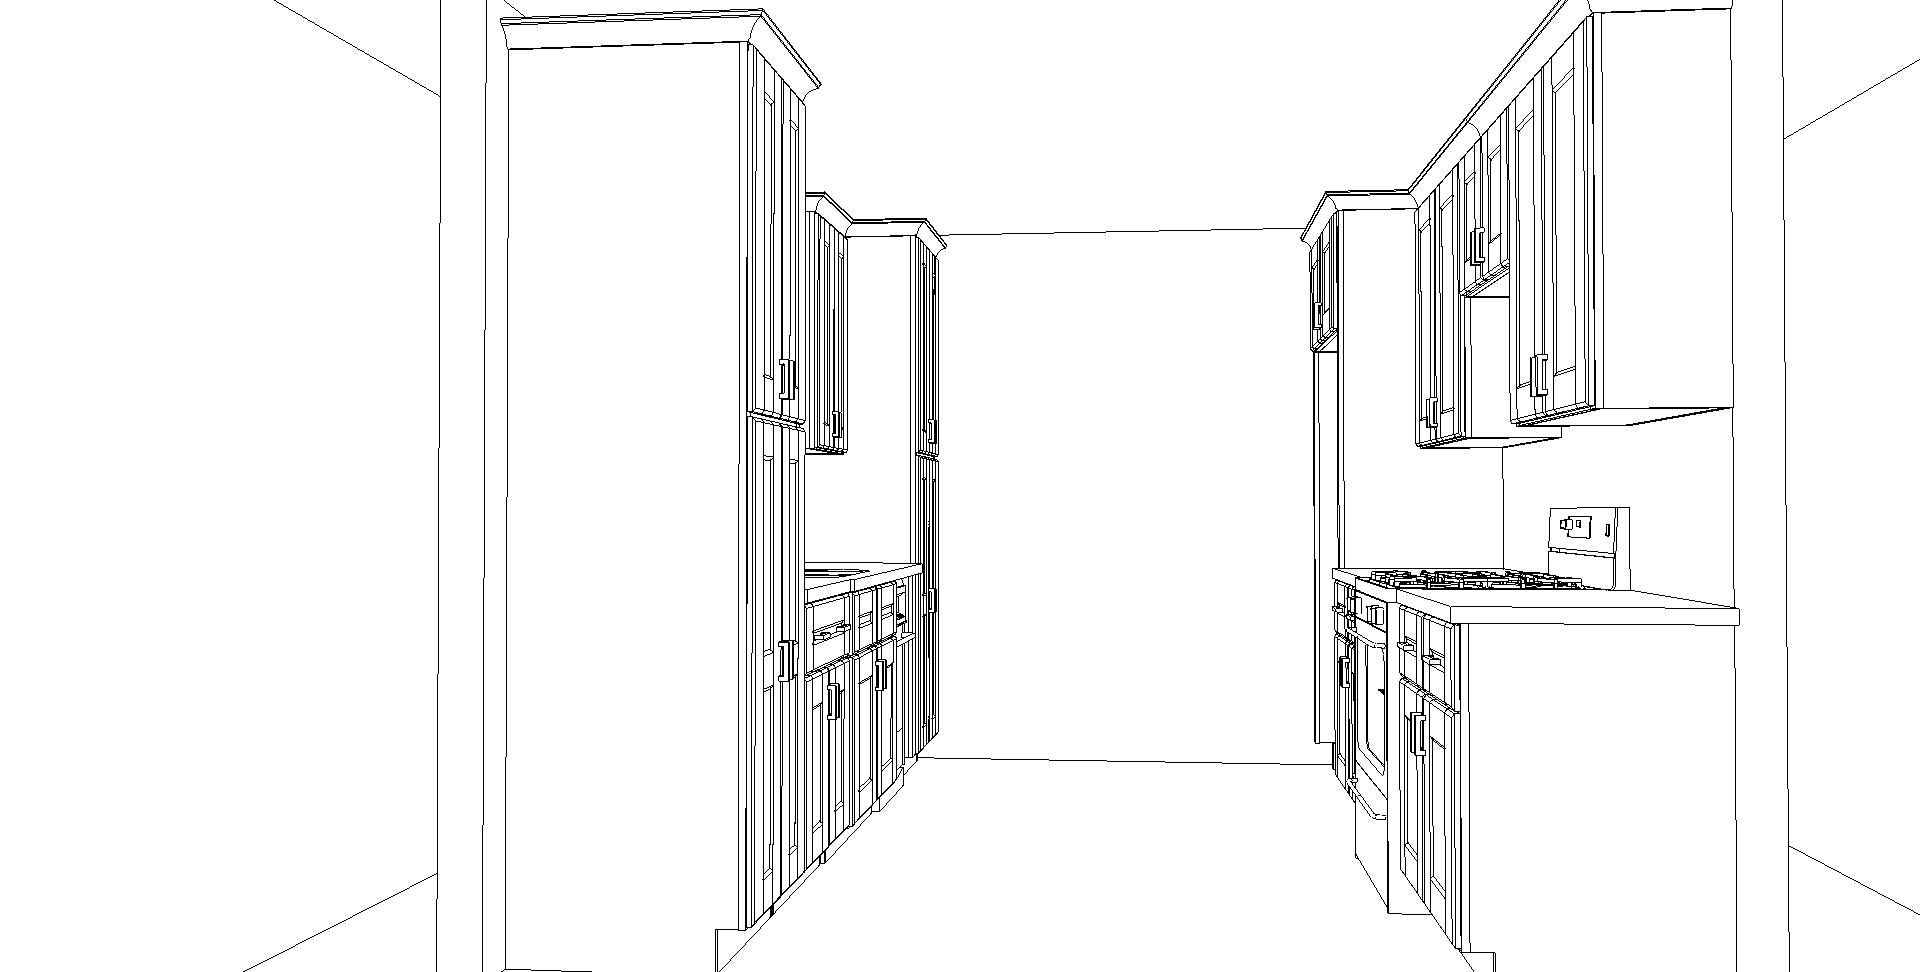 Galley Kitchen Outline CabinetCorp